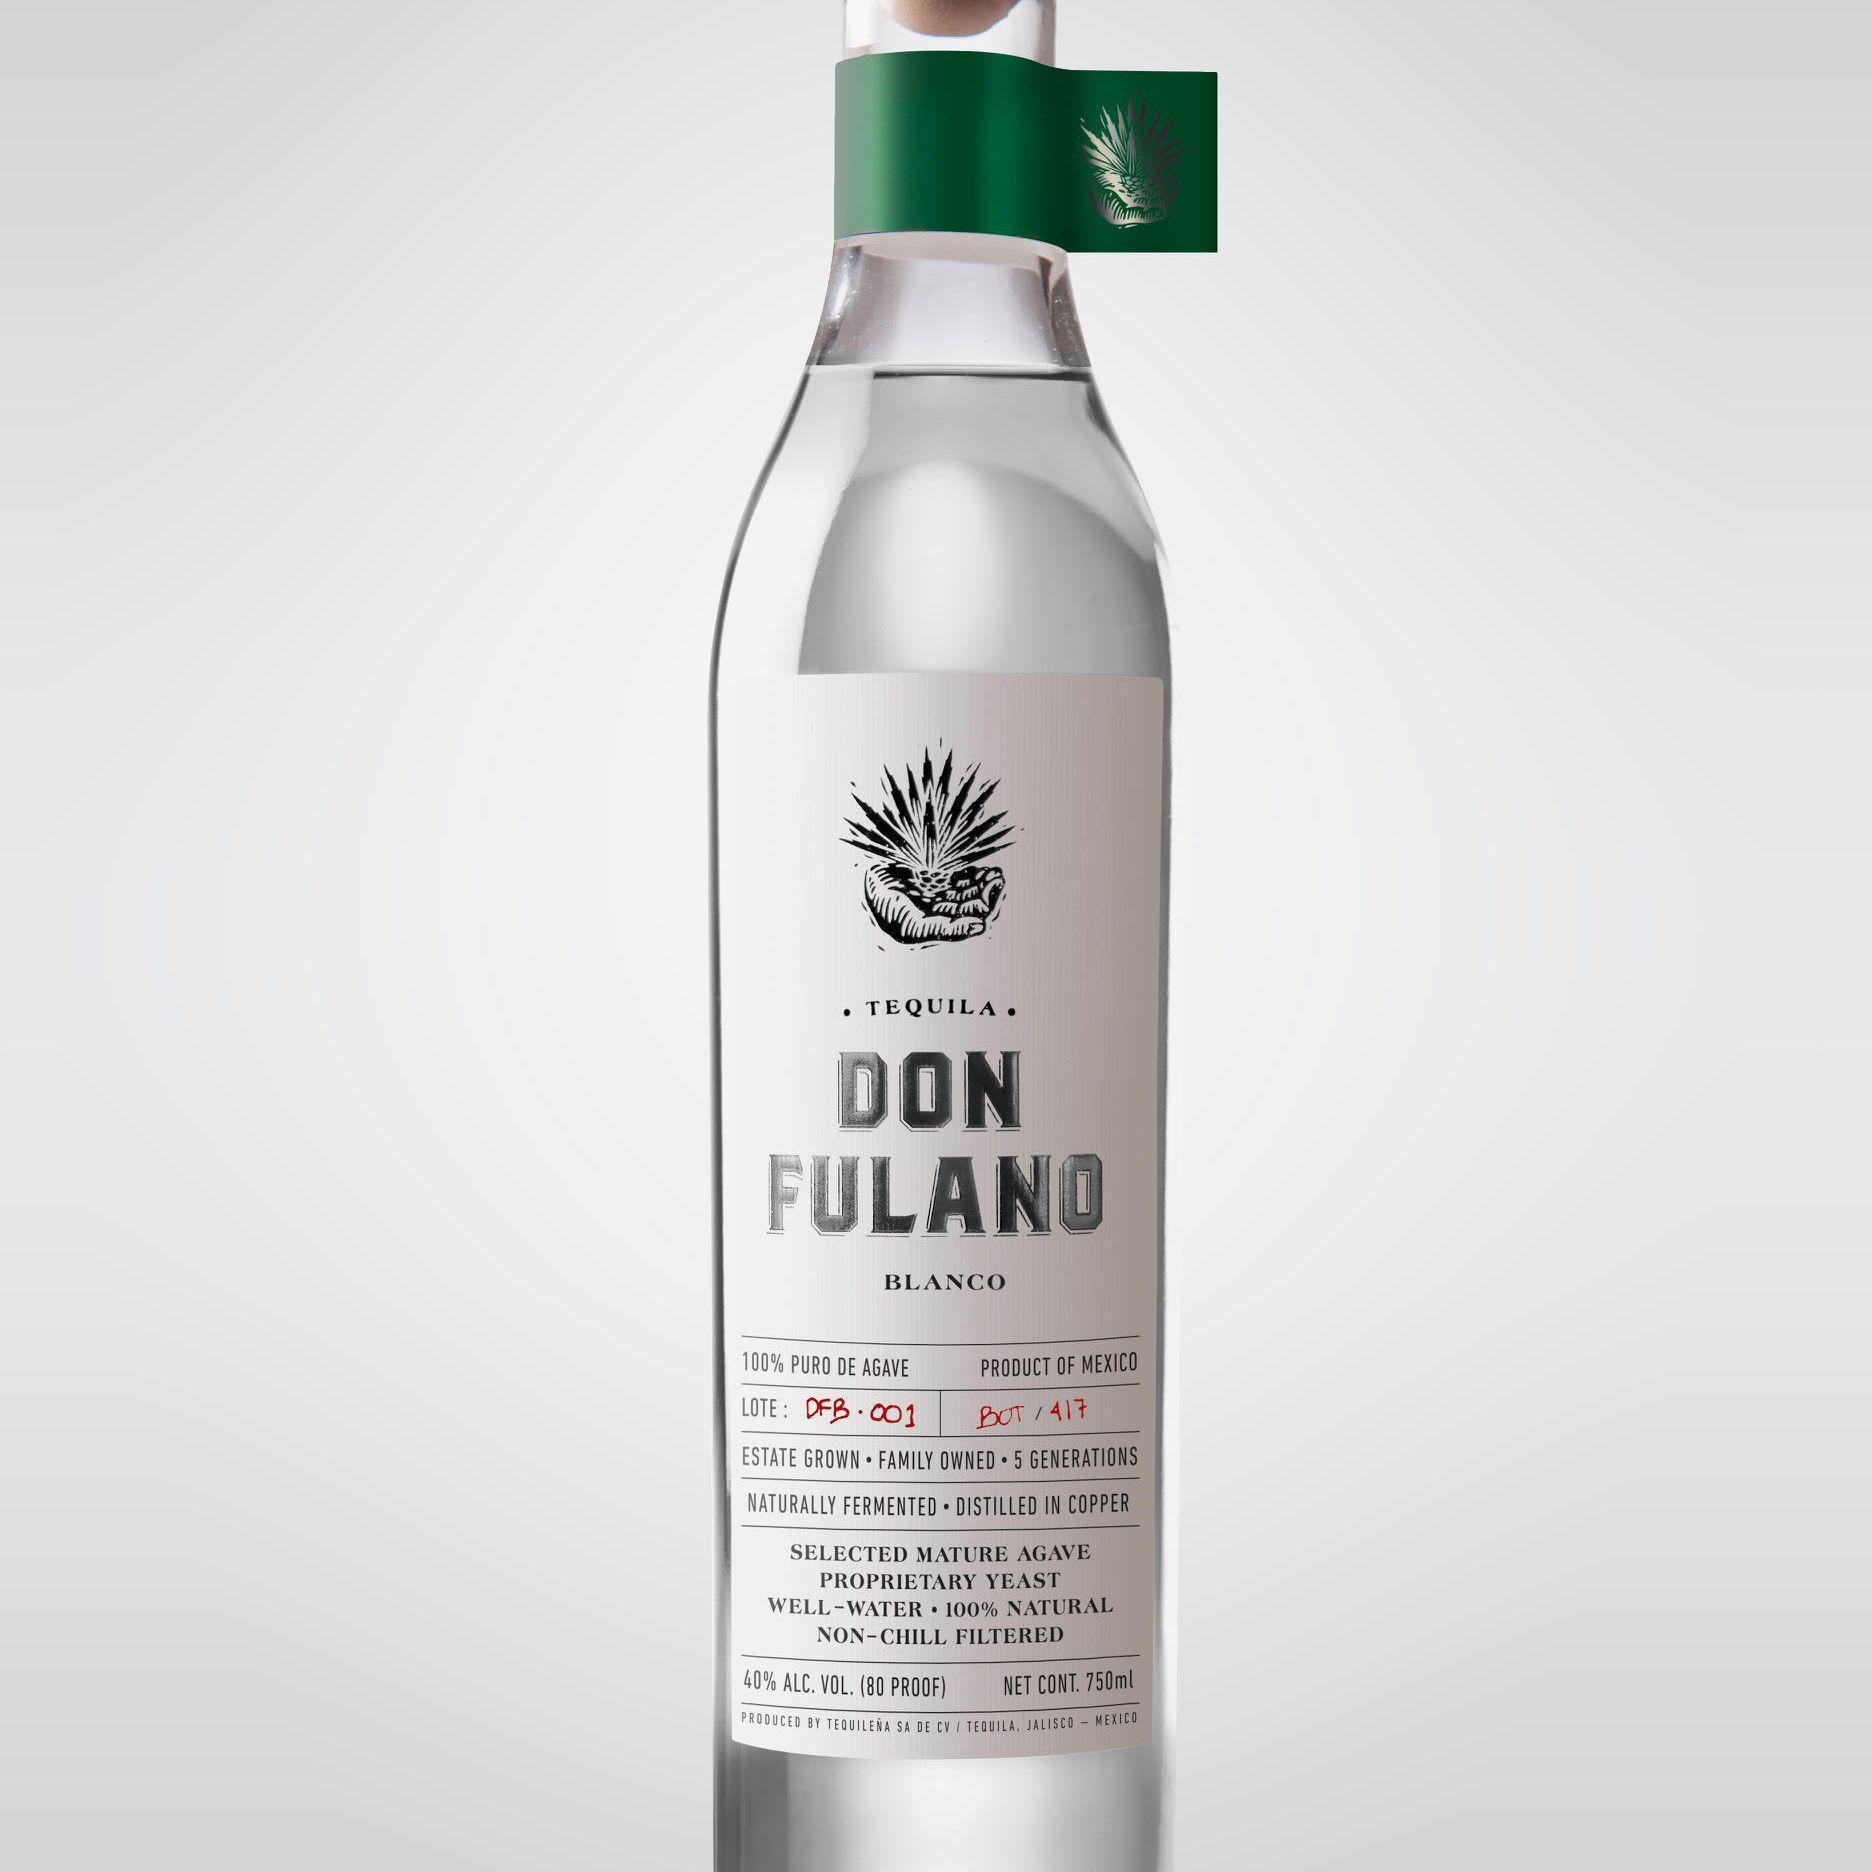 Don Fulano Blanco